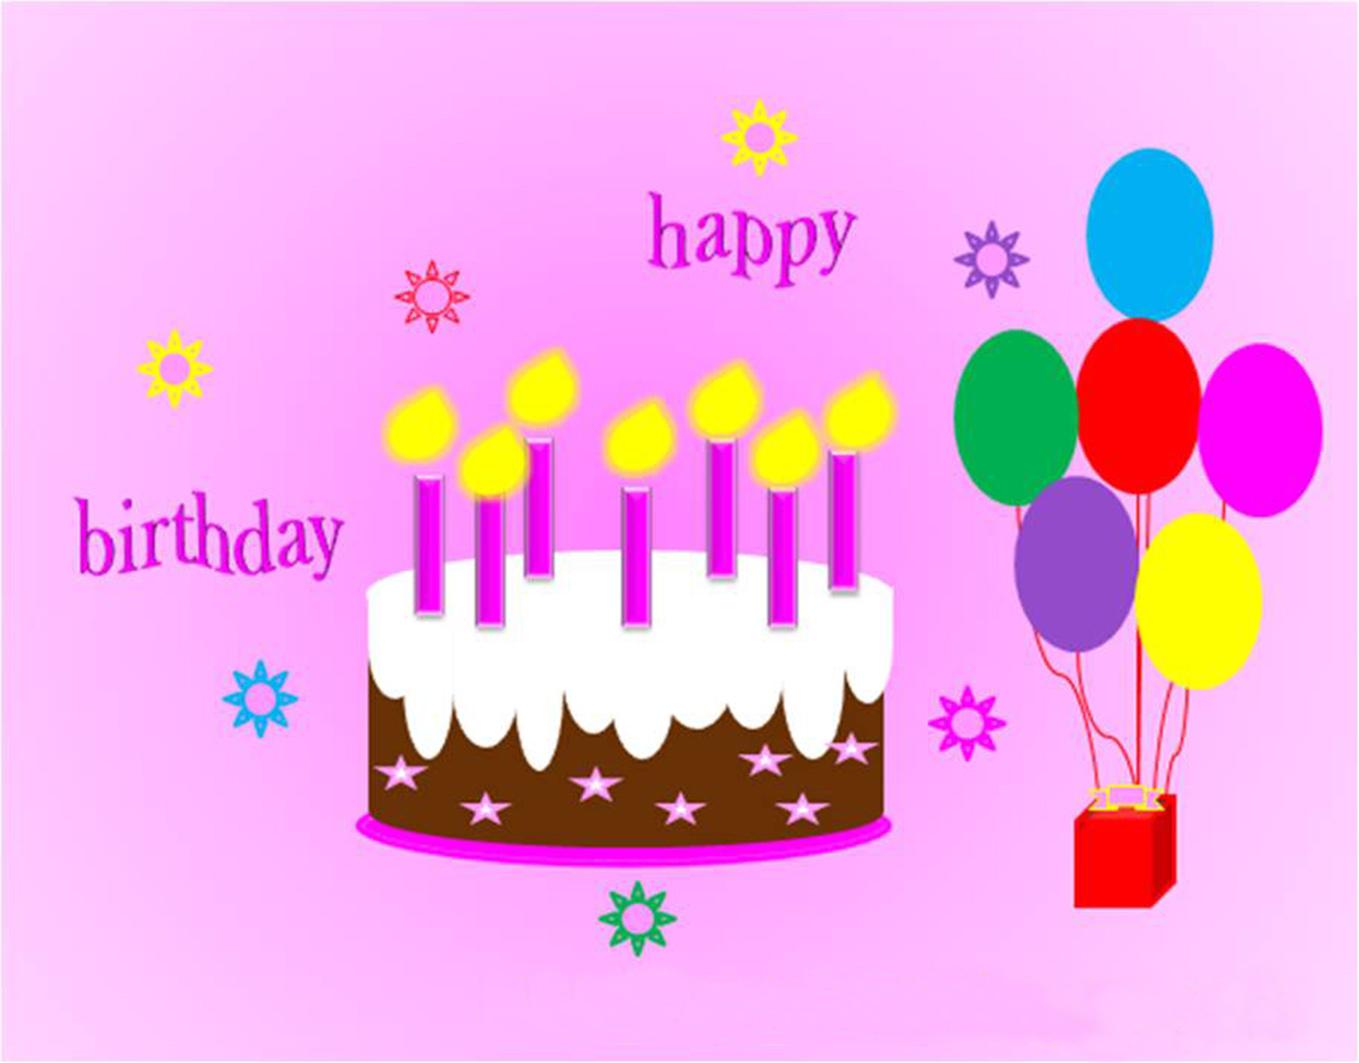 Drawn cake birthday greeting Birthday Happy Birthday Simple Background